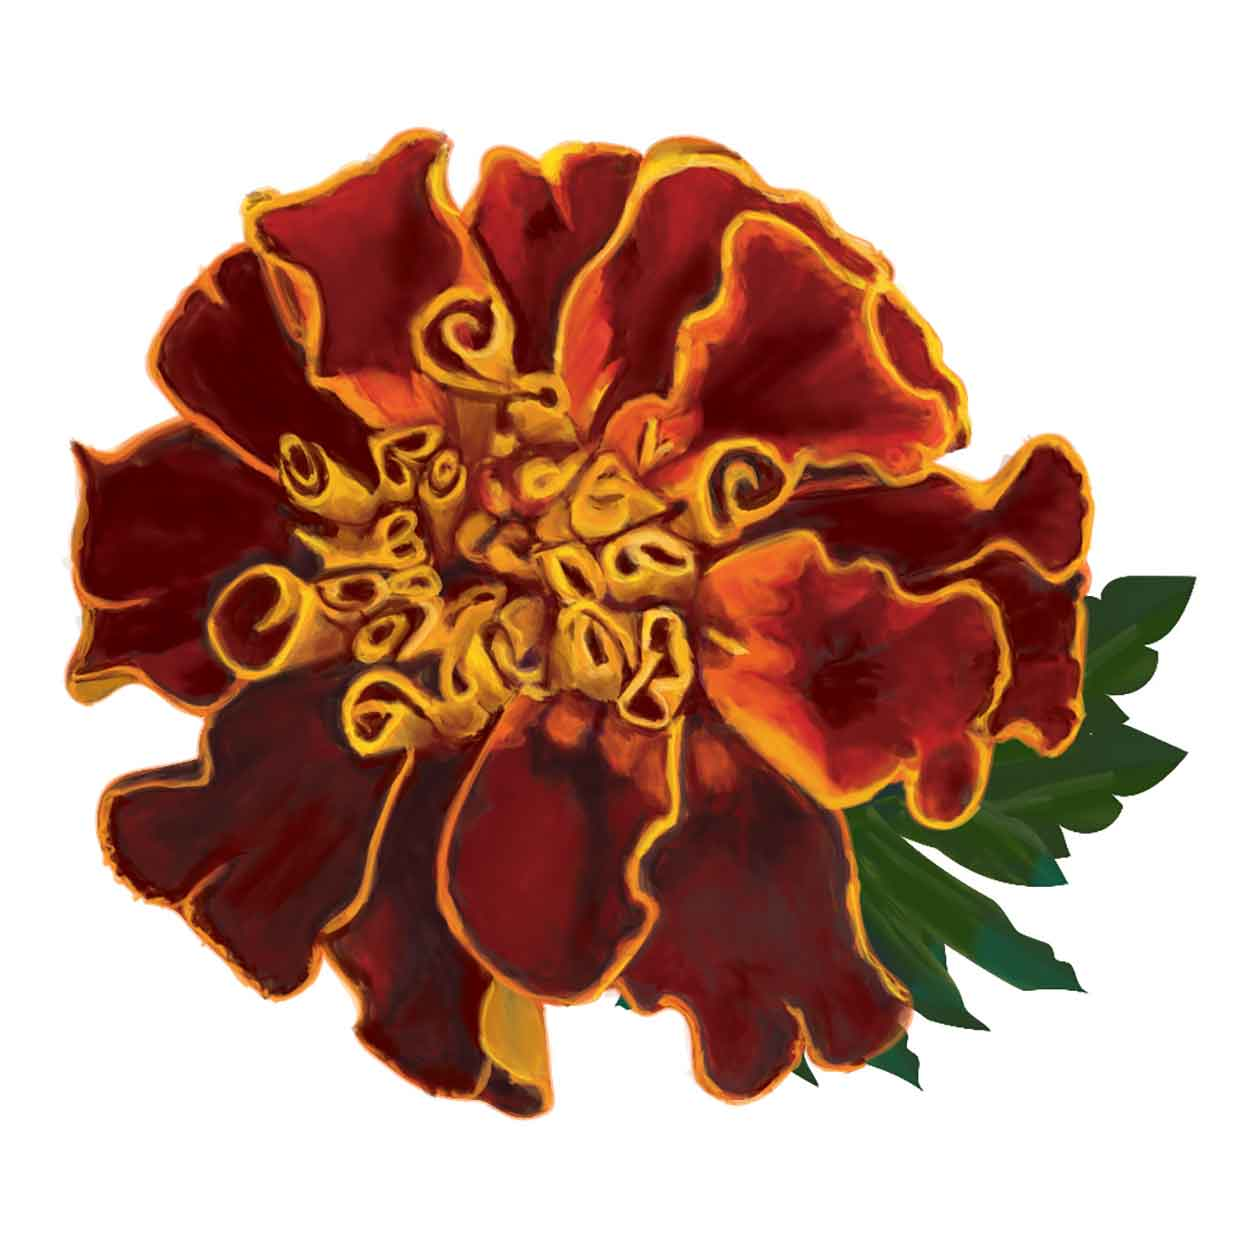 Orange and Saffron Aztec marigold